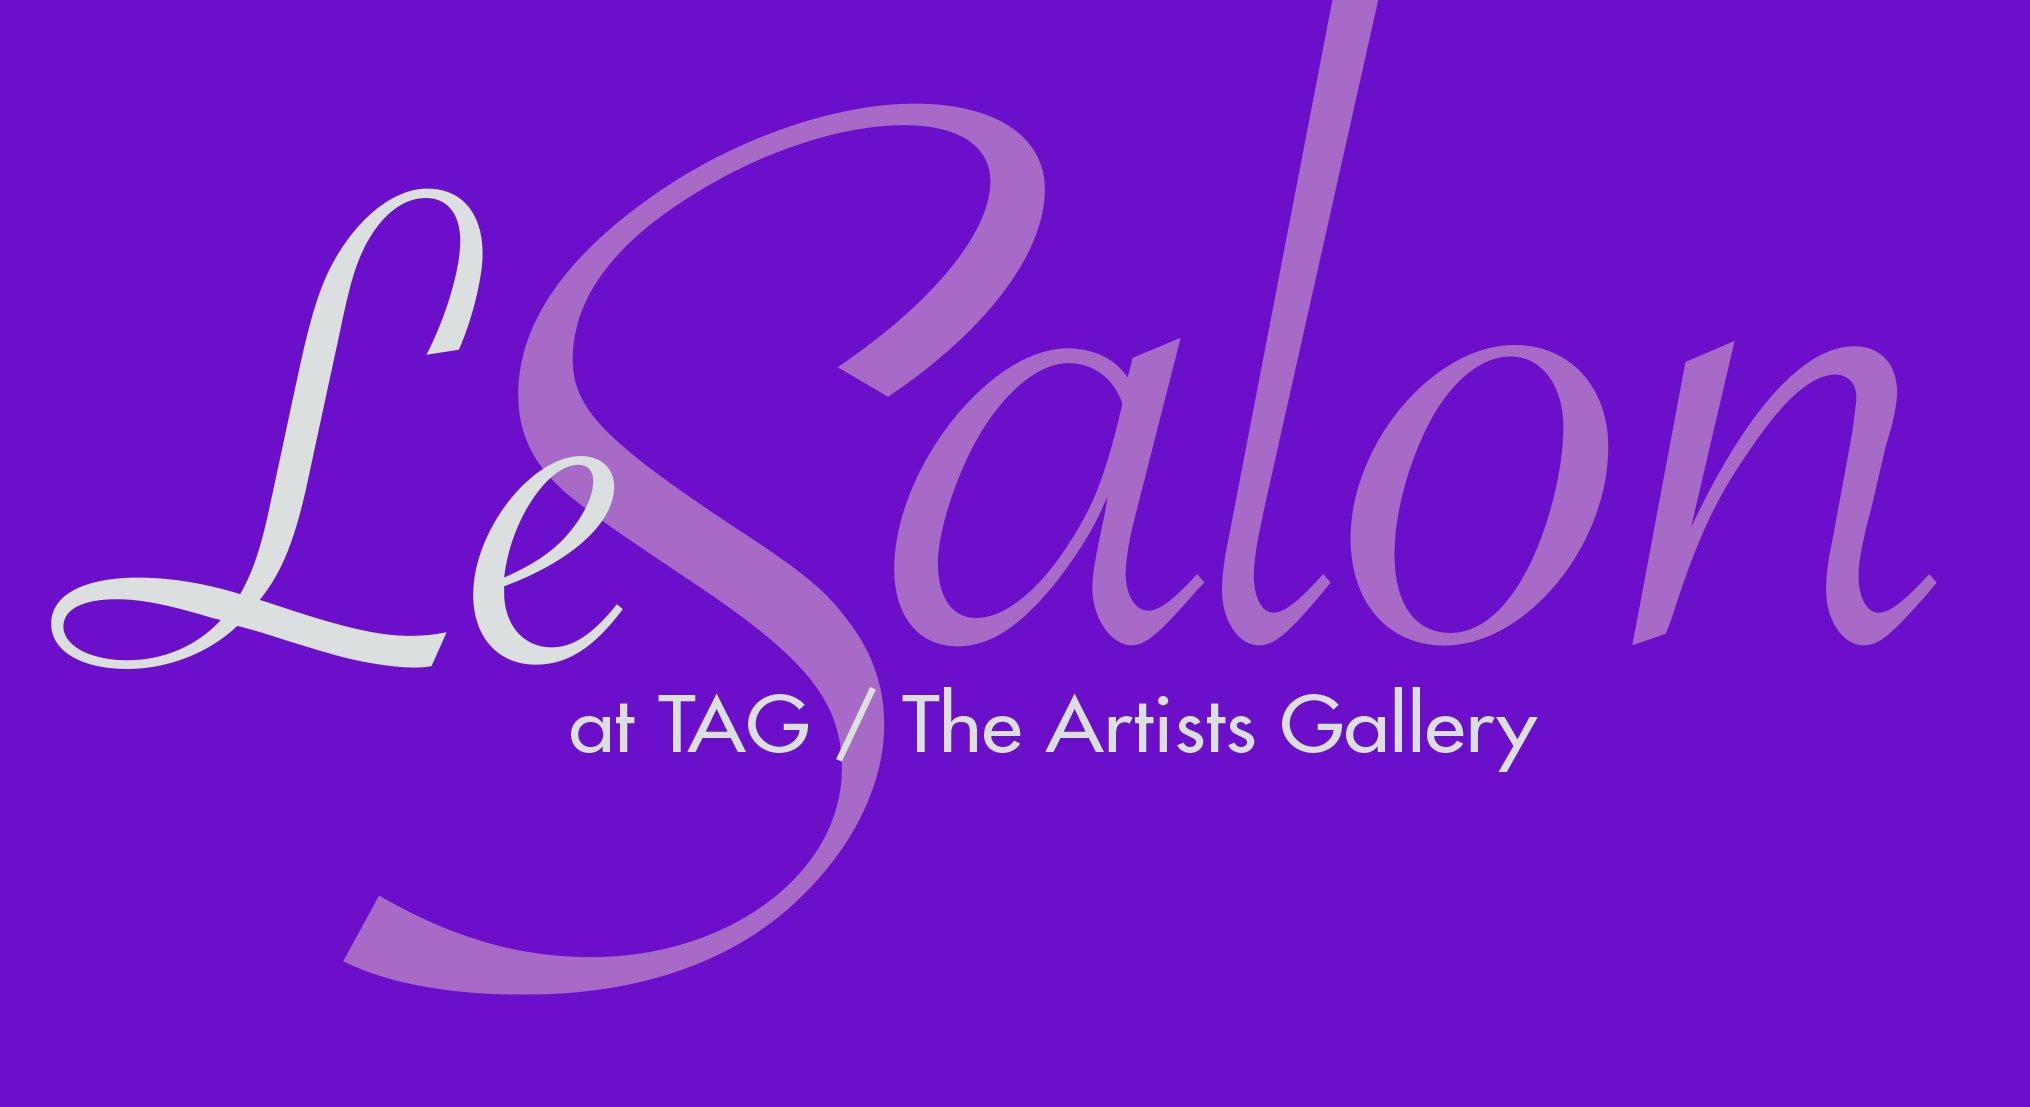 Le Salon at TAG